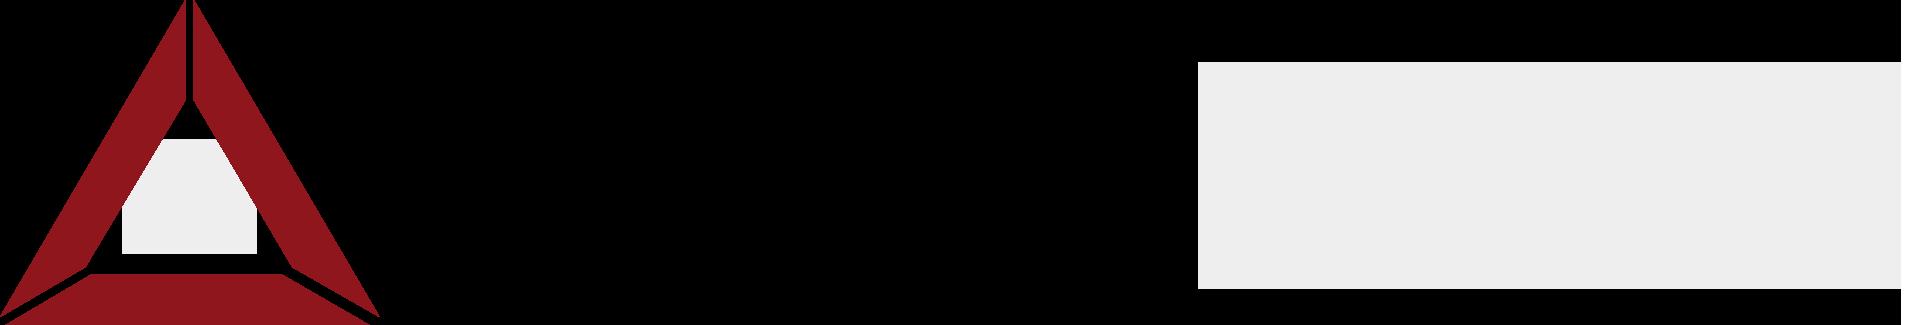 Omnidata, LLC